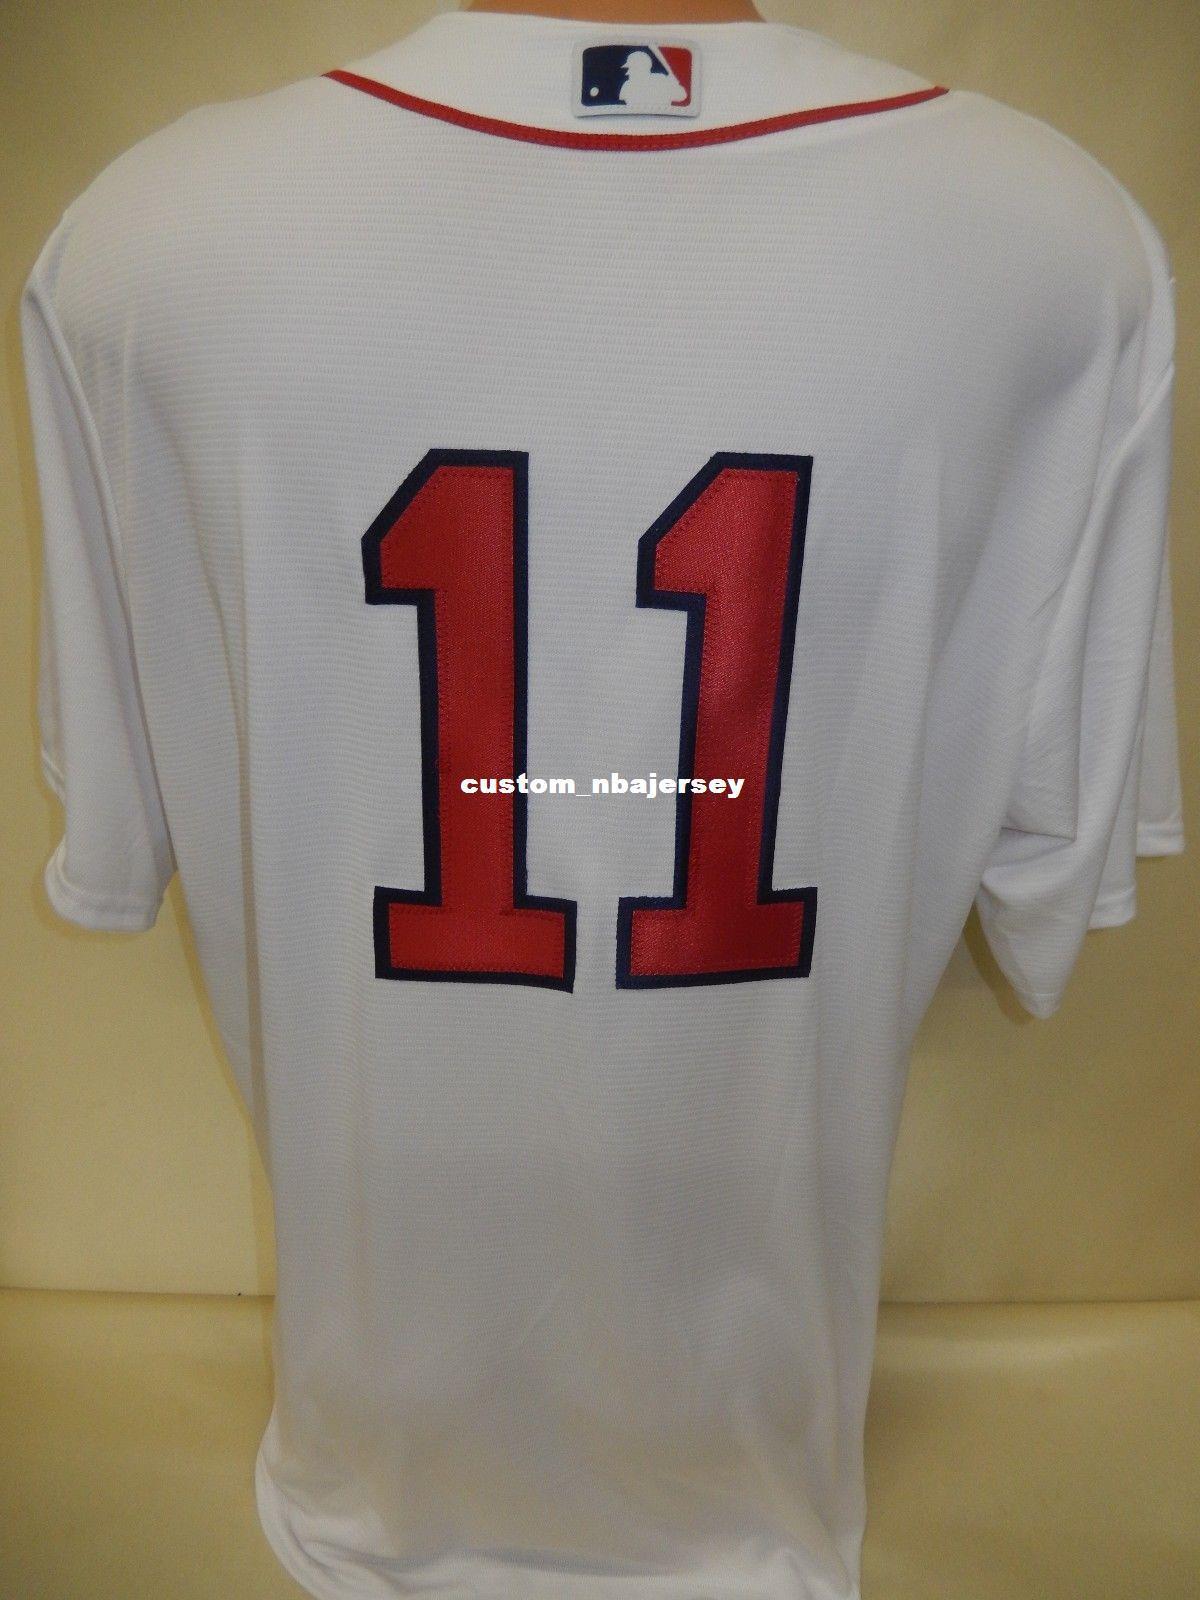 online store 17c41 1f12d Cheap custom RAFAEL DEVERS SEWN Cool Base Baseball Jersey WHITE Stitched  Customize any name number MEN WOMEN BASEBALL JERSEY XS-5XL